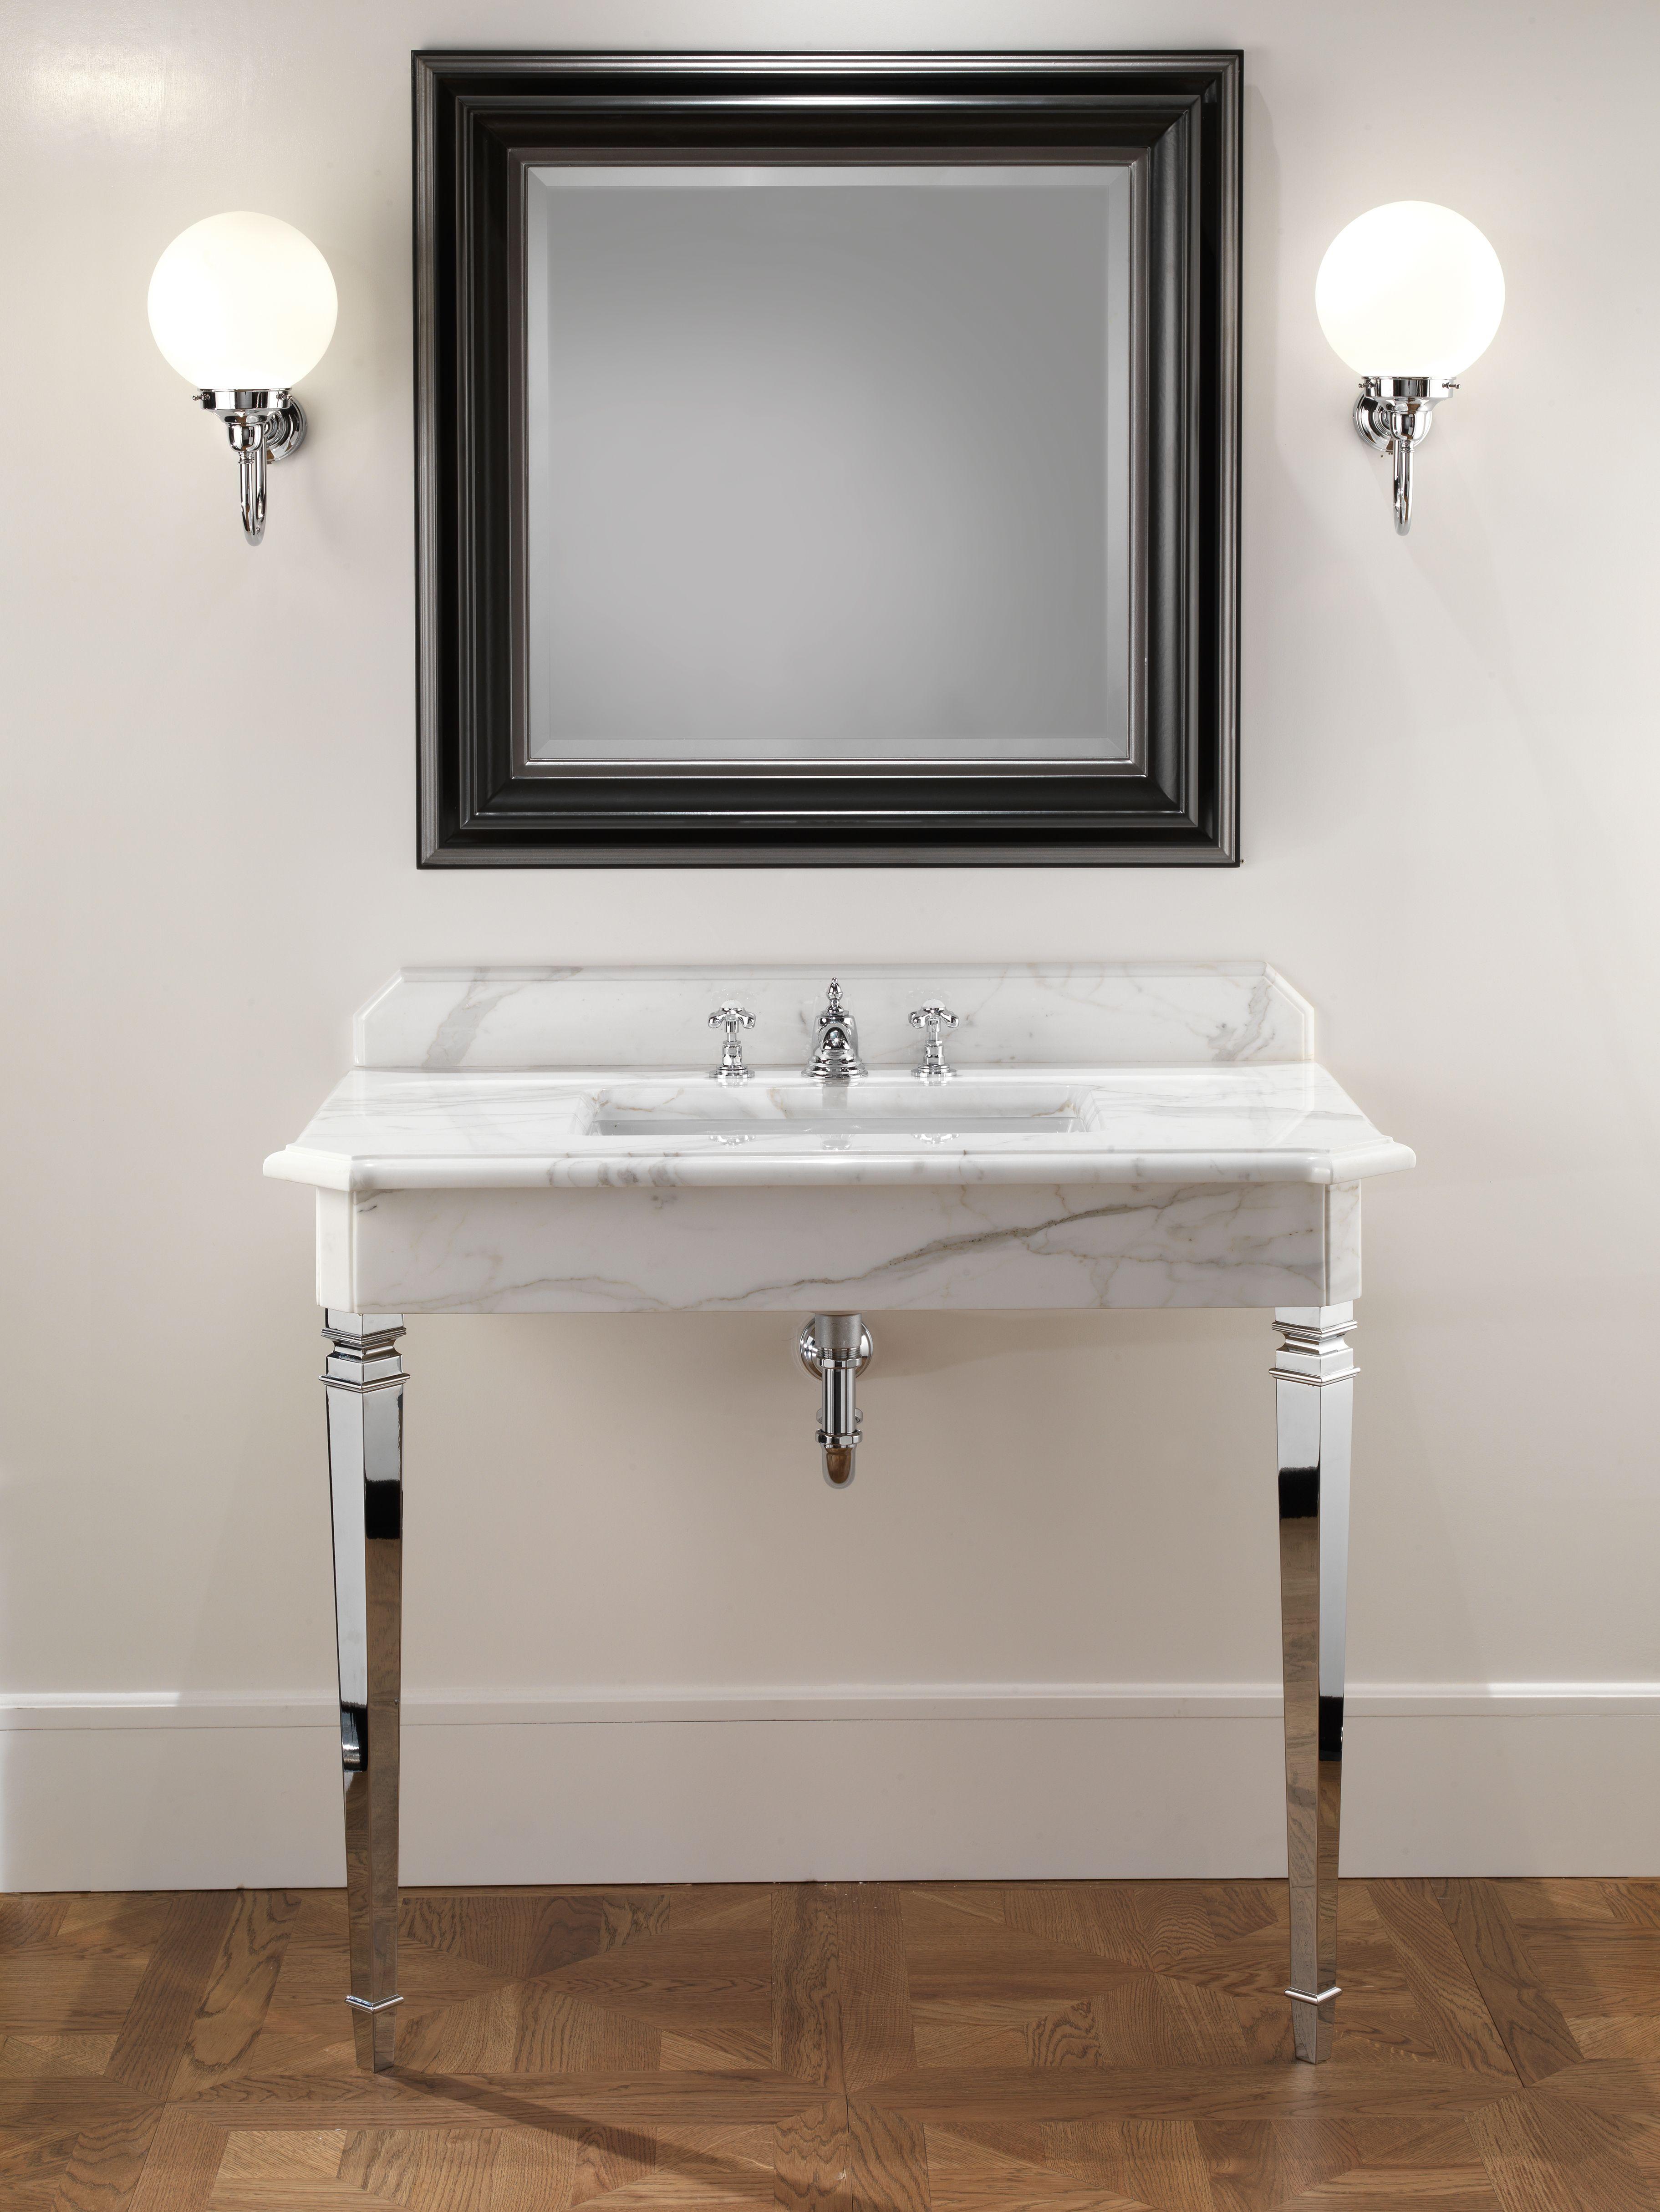 vanities glass custom pros largecustommirrors mirrors diego creative vanity and san mirror gallery decoration bathroom